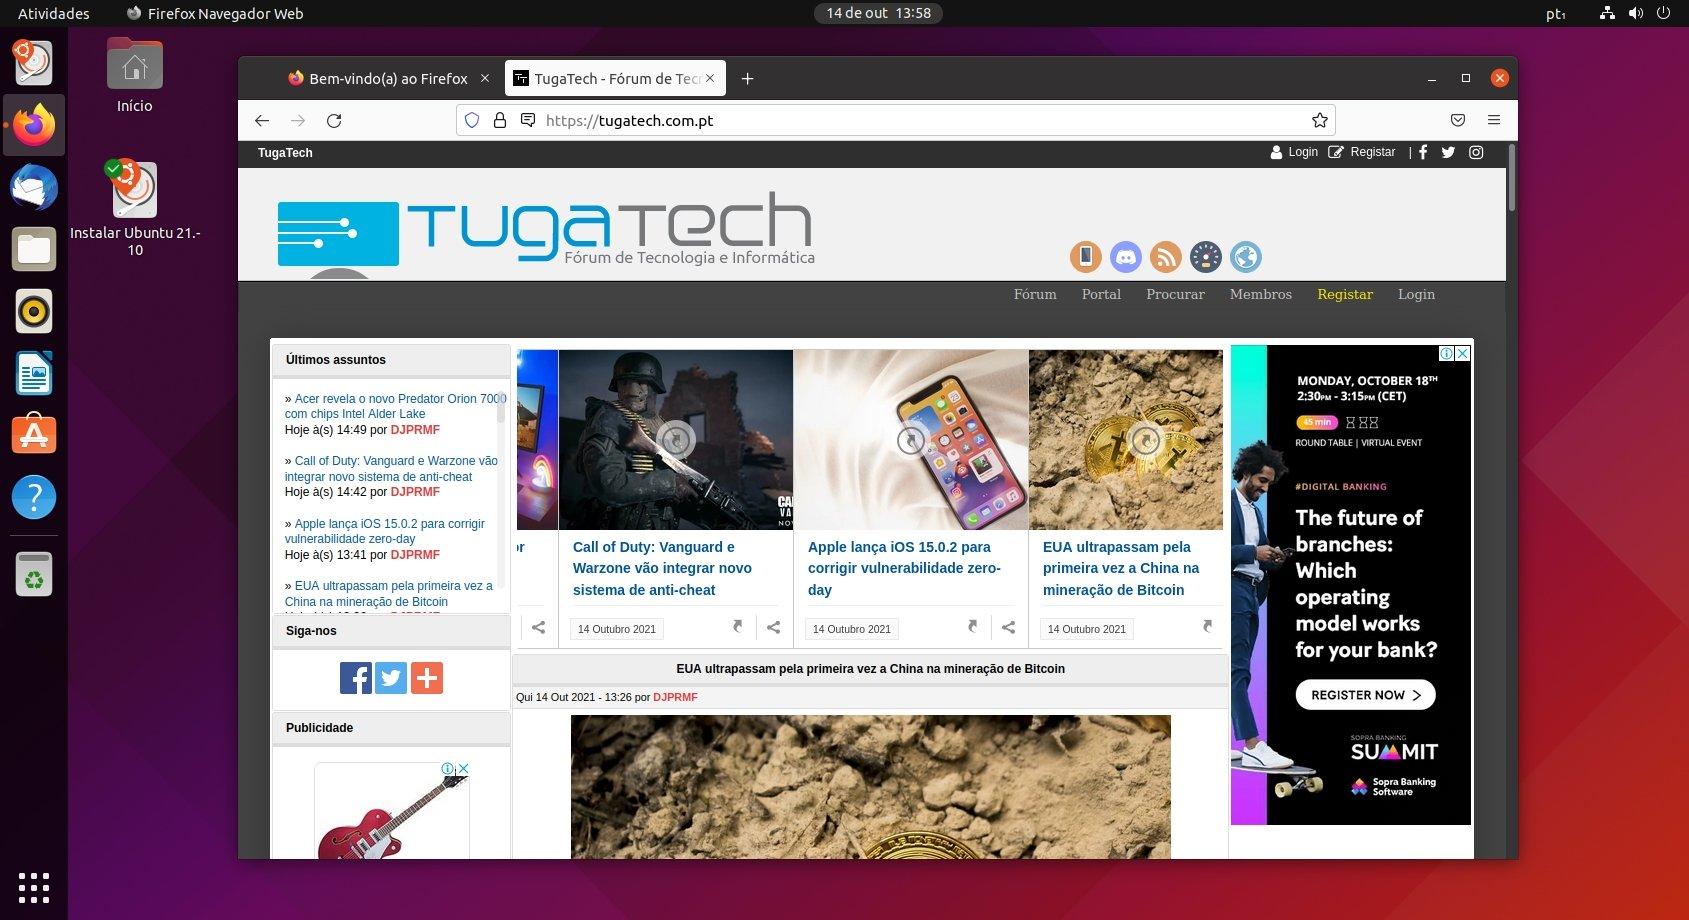 nova interface Ubuntu 21.10